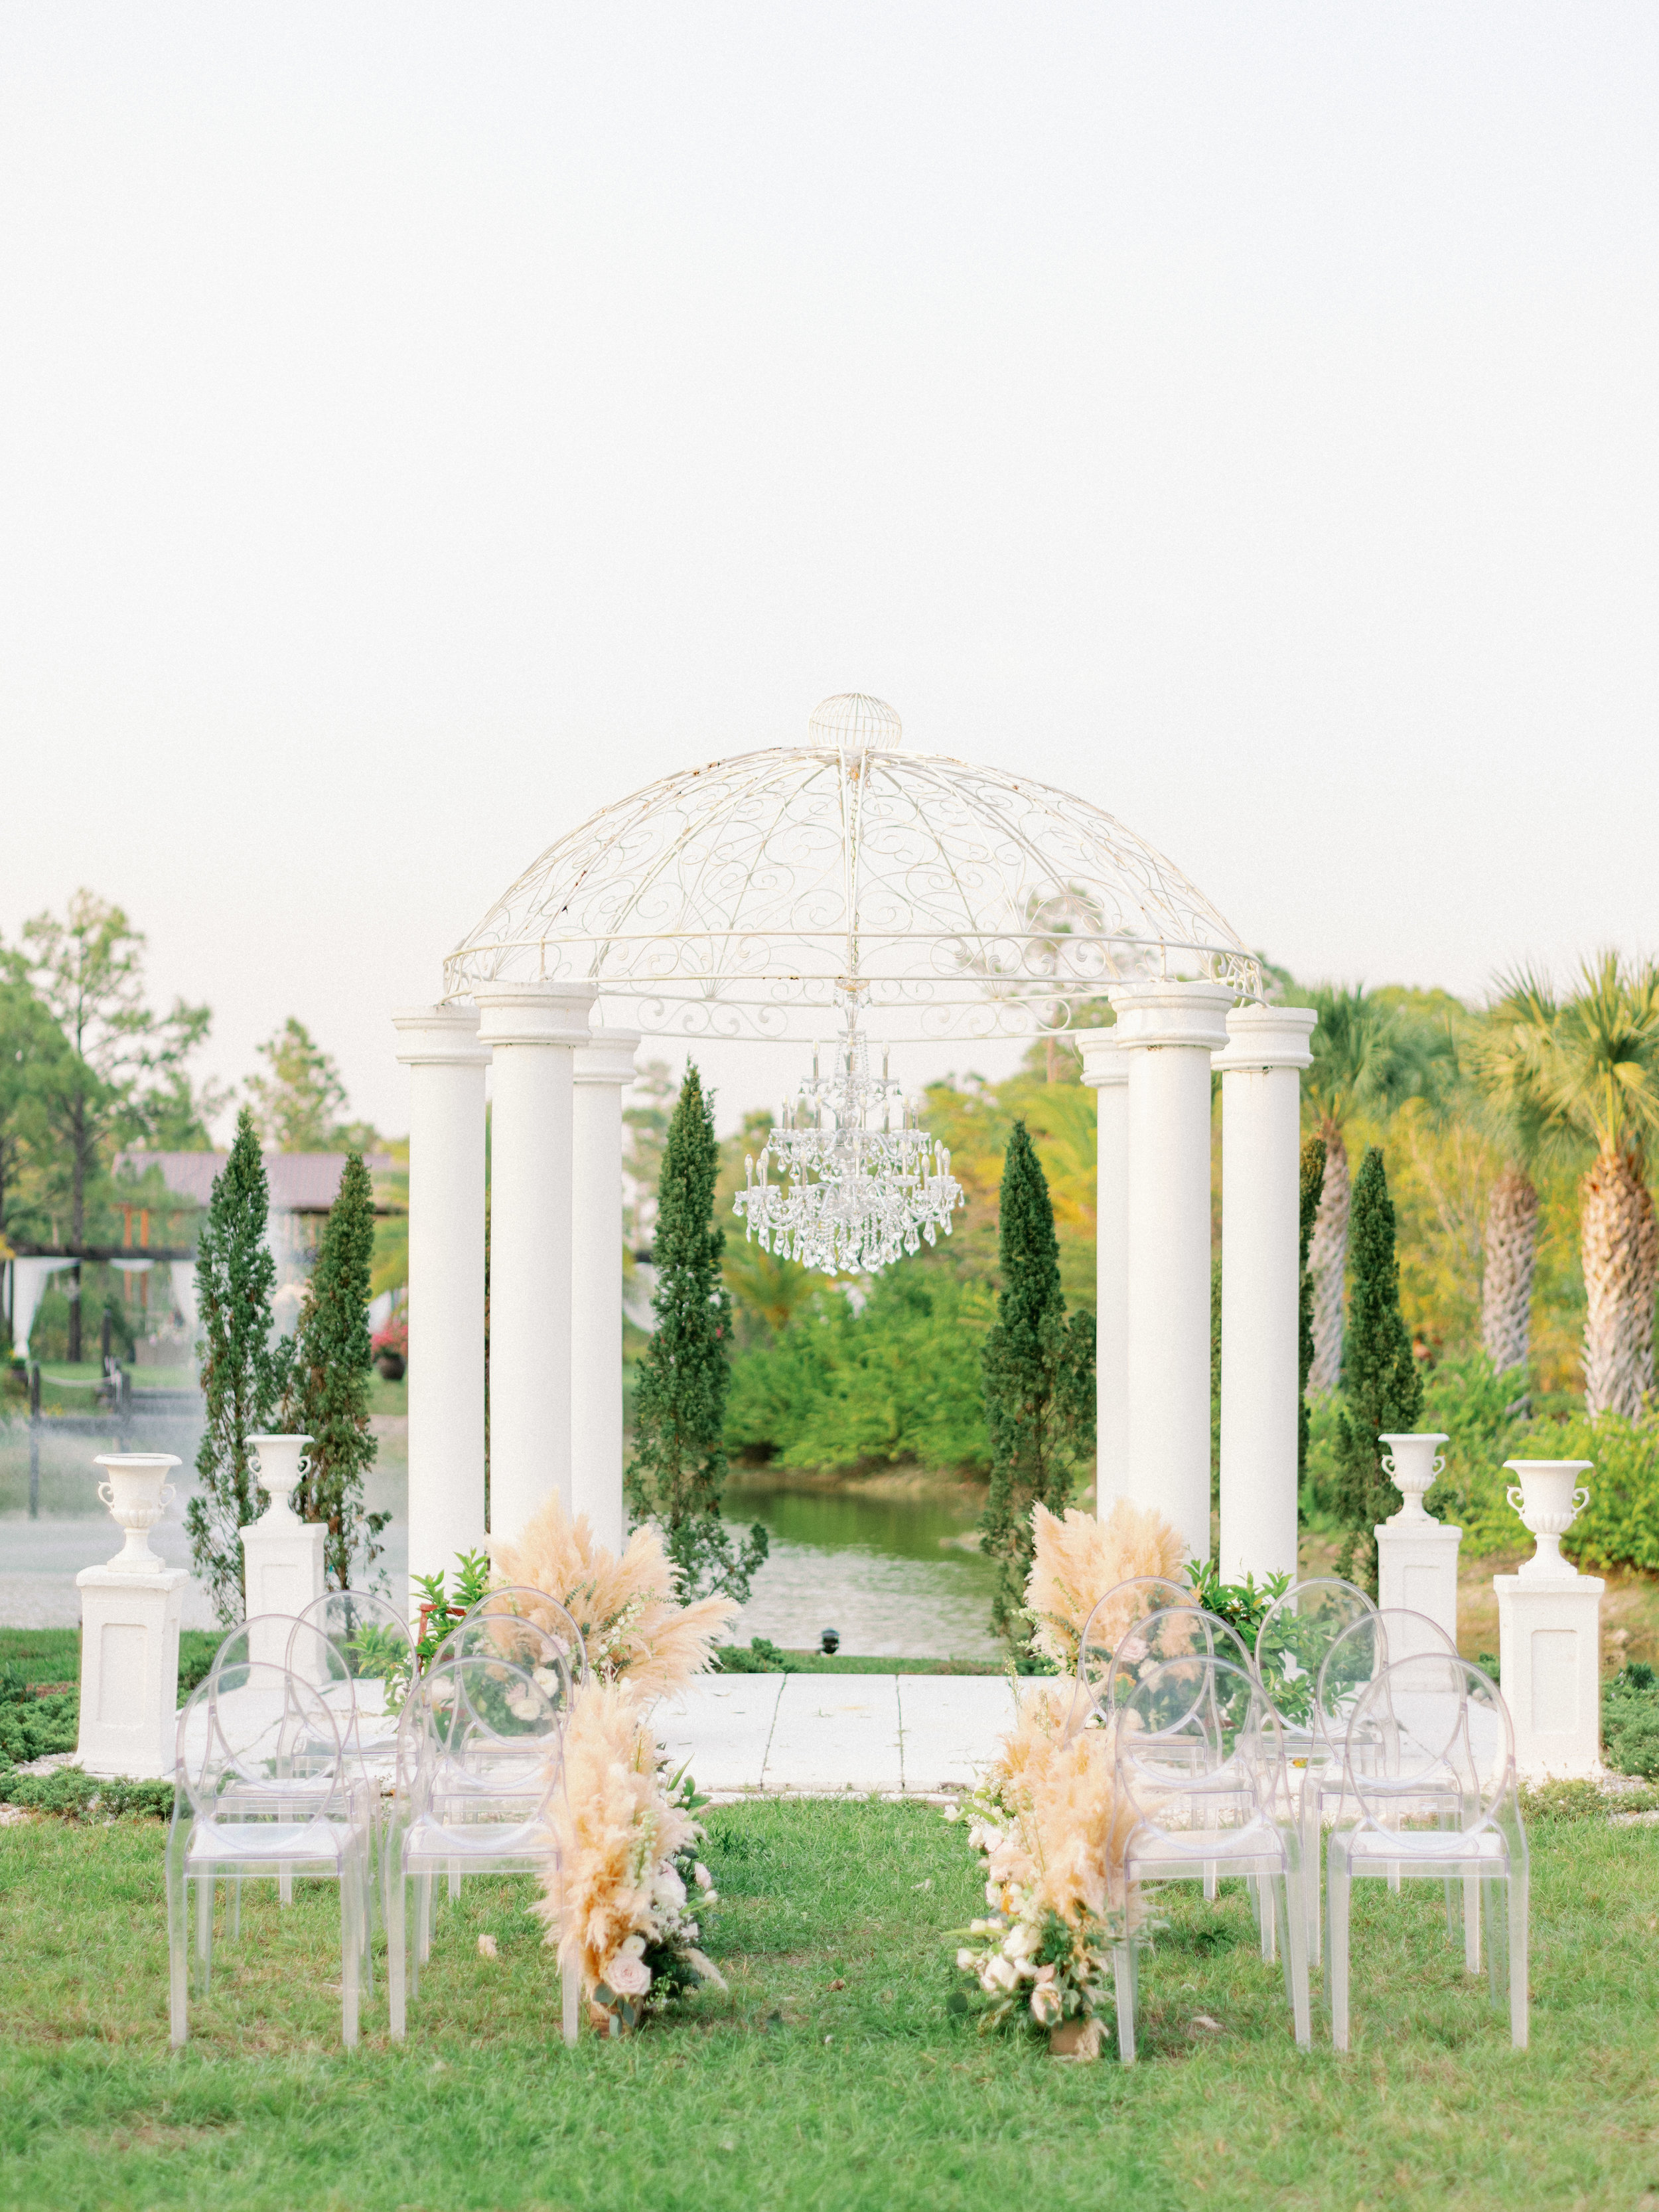 florida-wedding-fort-myers-la-casa-toscana-outdoor-ceremony-wedding-white-gazebo-planned-by-mostly-becky-weddings-traveling-wedding-planner-destination-wedding-lakeside-bridal-portraits-bride-groom-black-tie-tux-formal-wedding